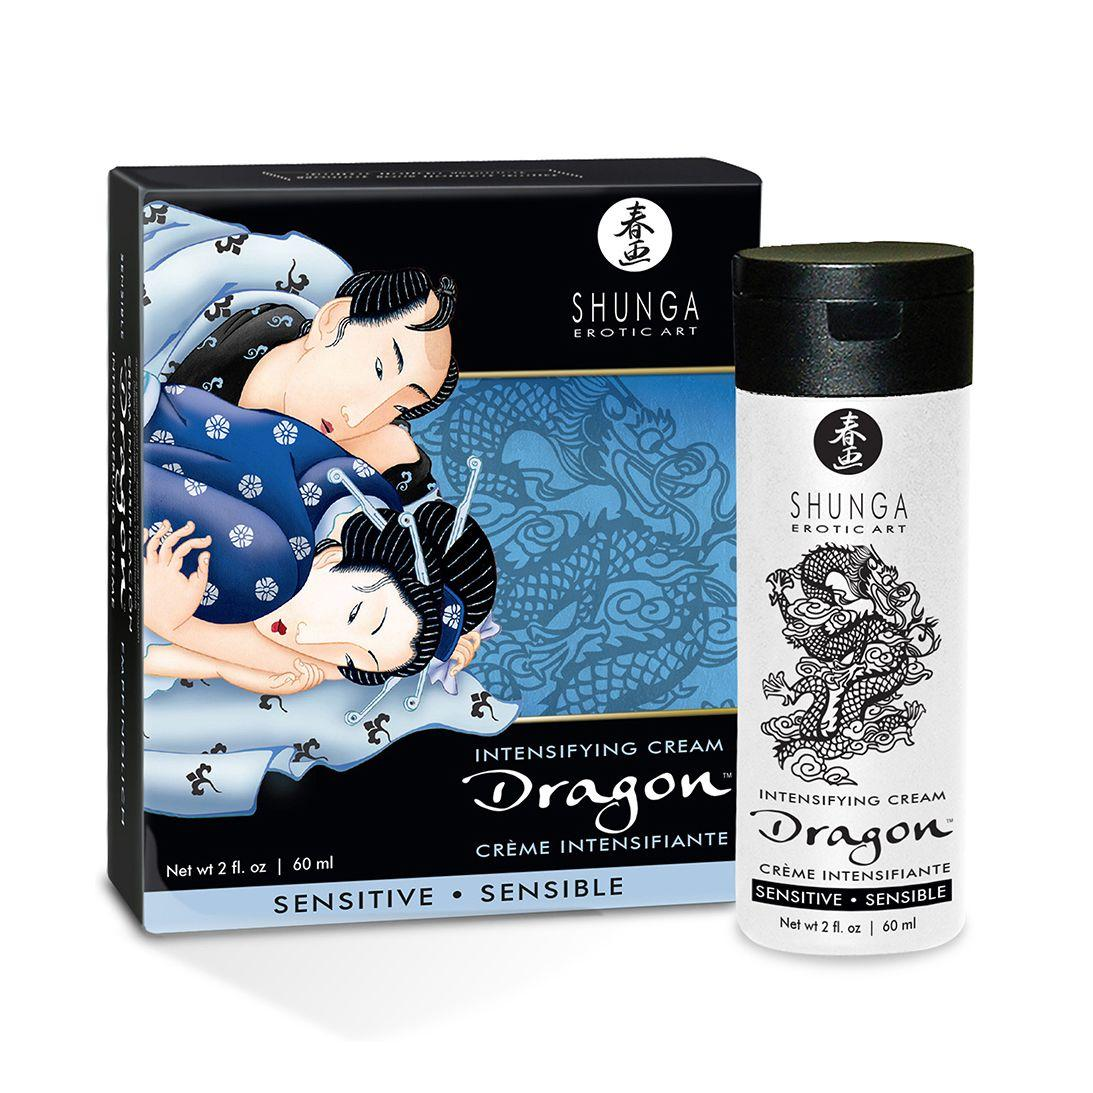 Стимулирующий крем для пар Shunga Dragon Cream SENSITIVE, 60 мл